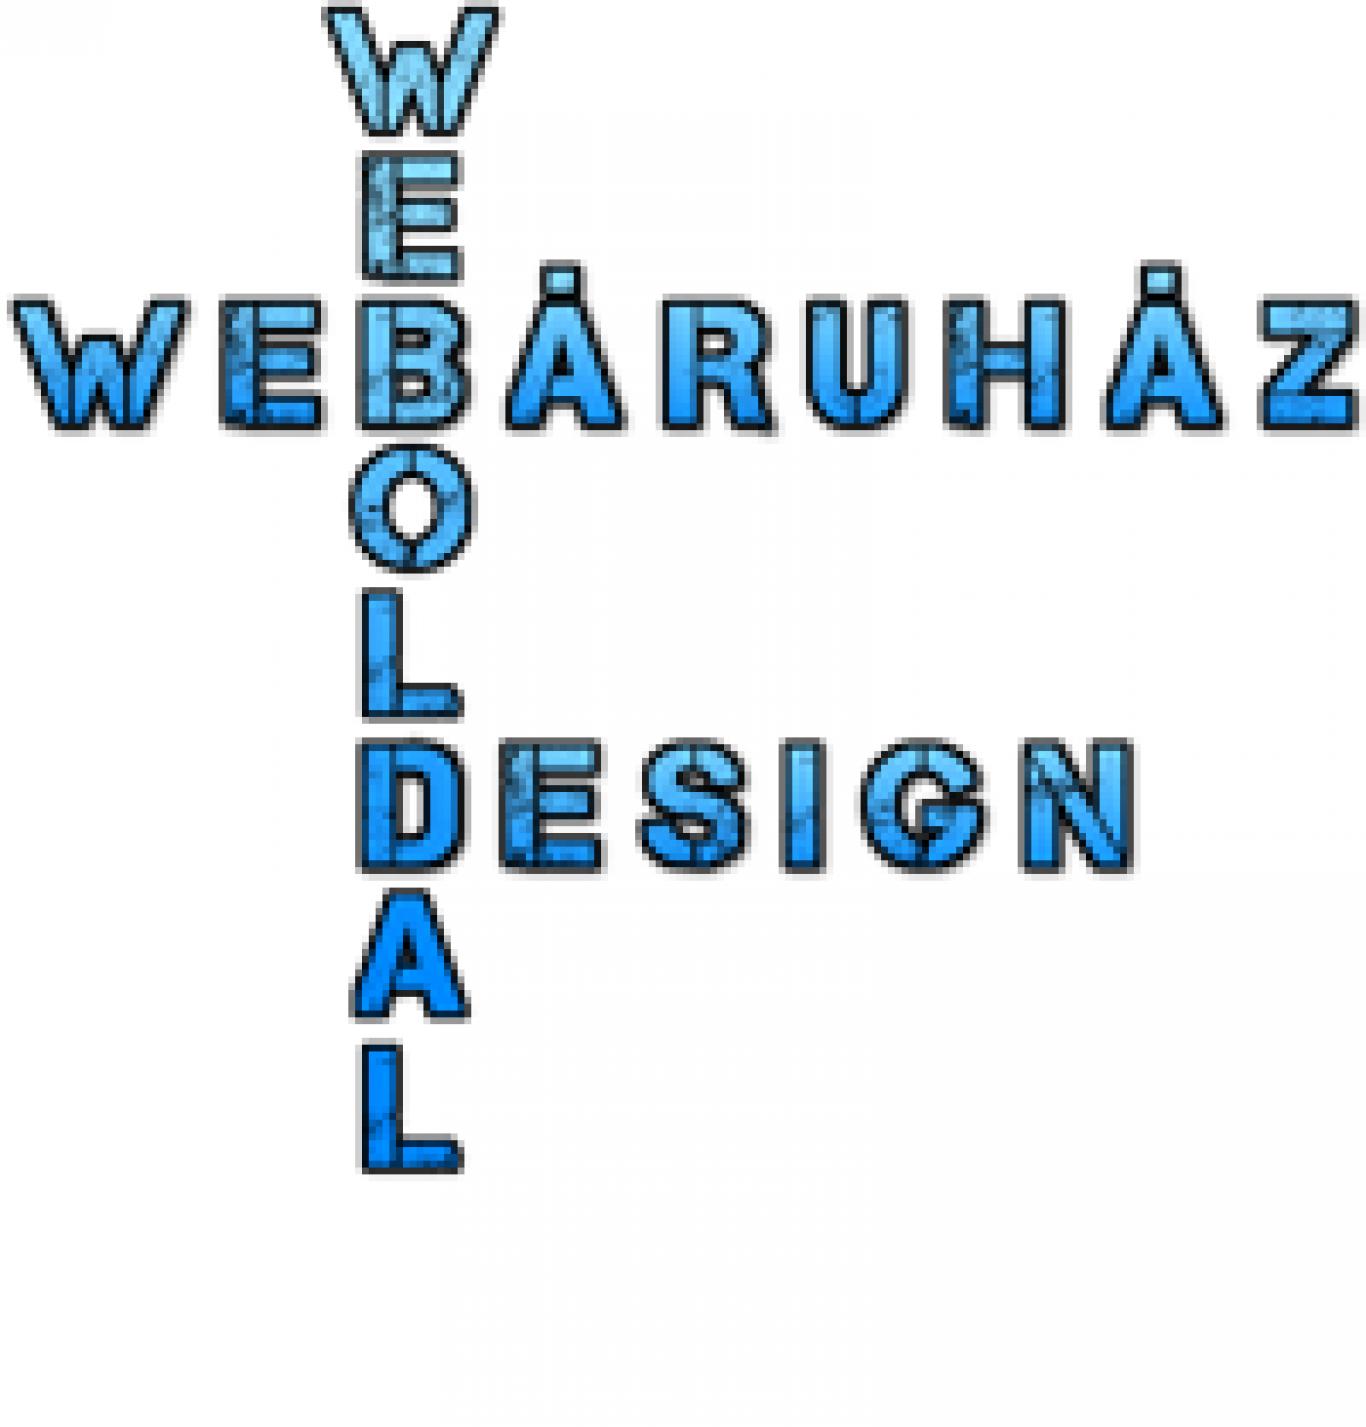 https://webshopjogasz.hu/WeblapWebáruház.hu